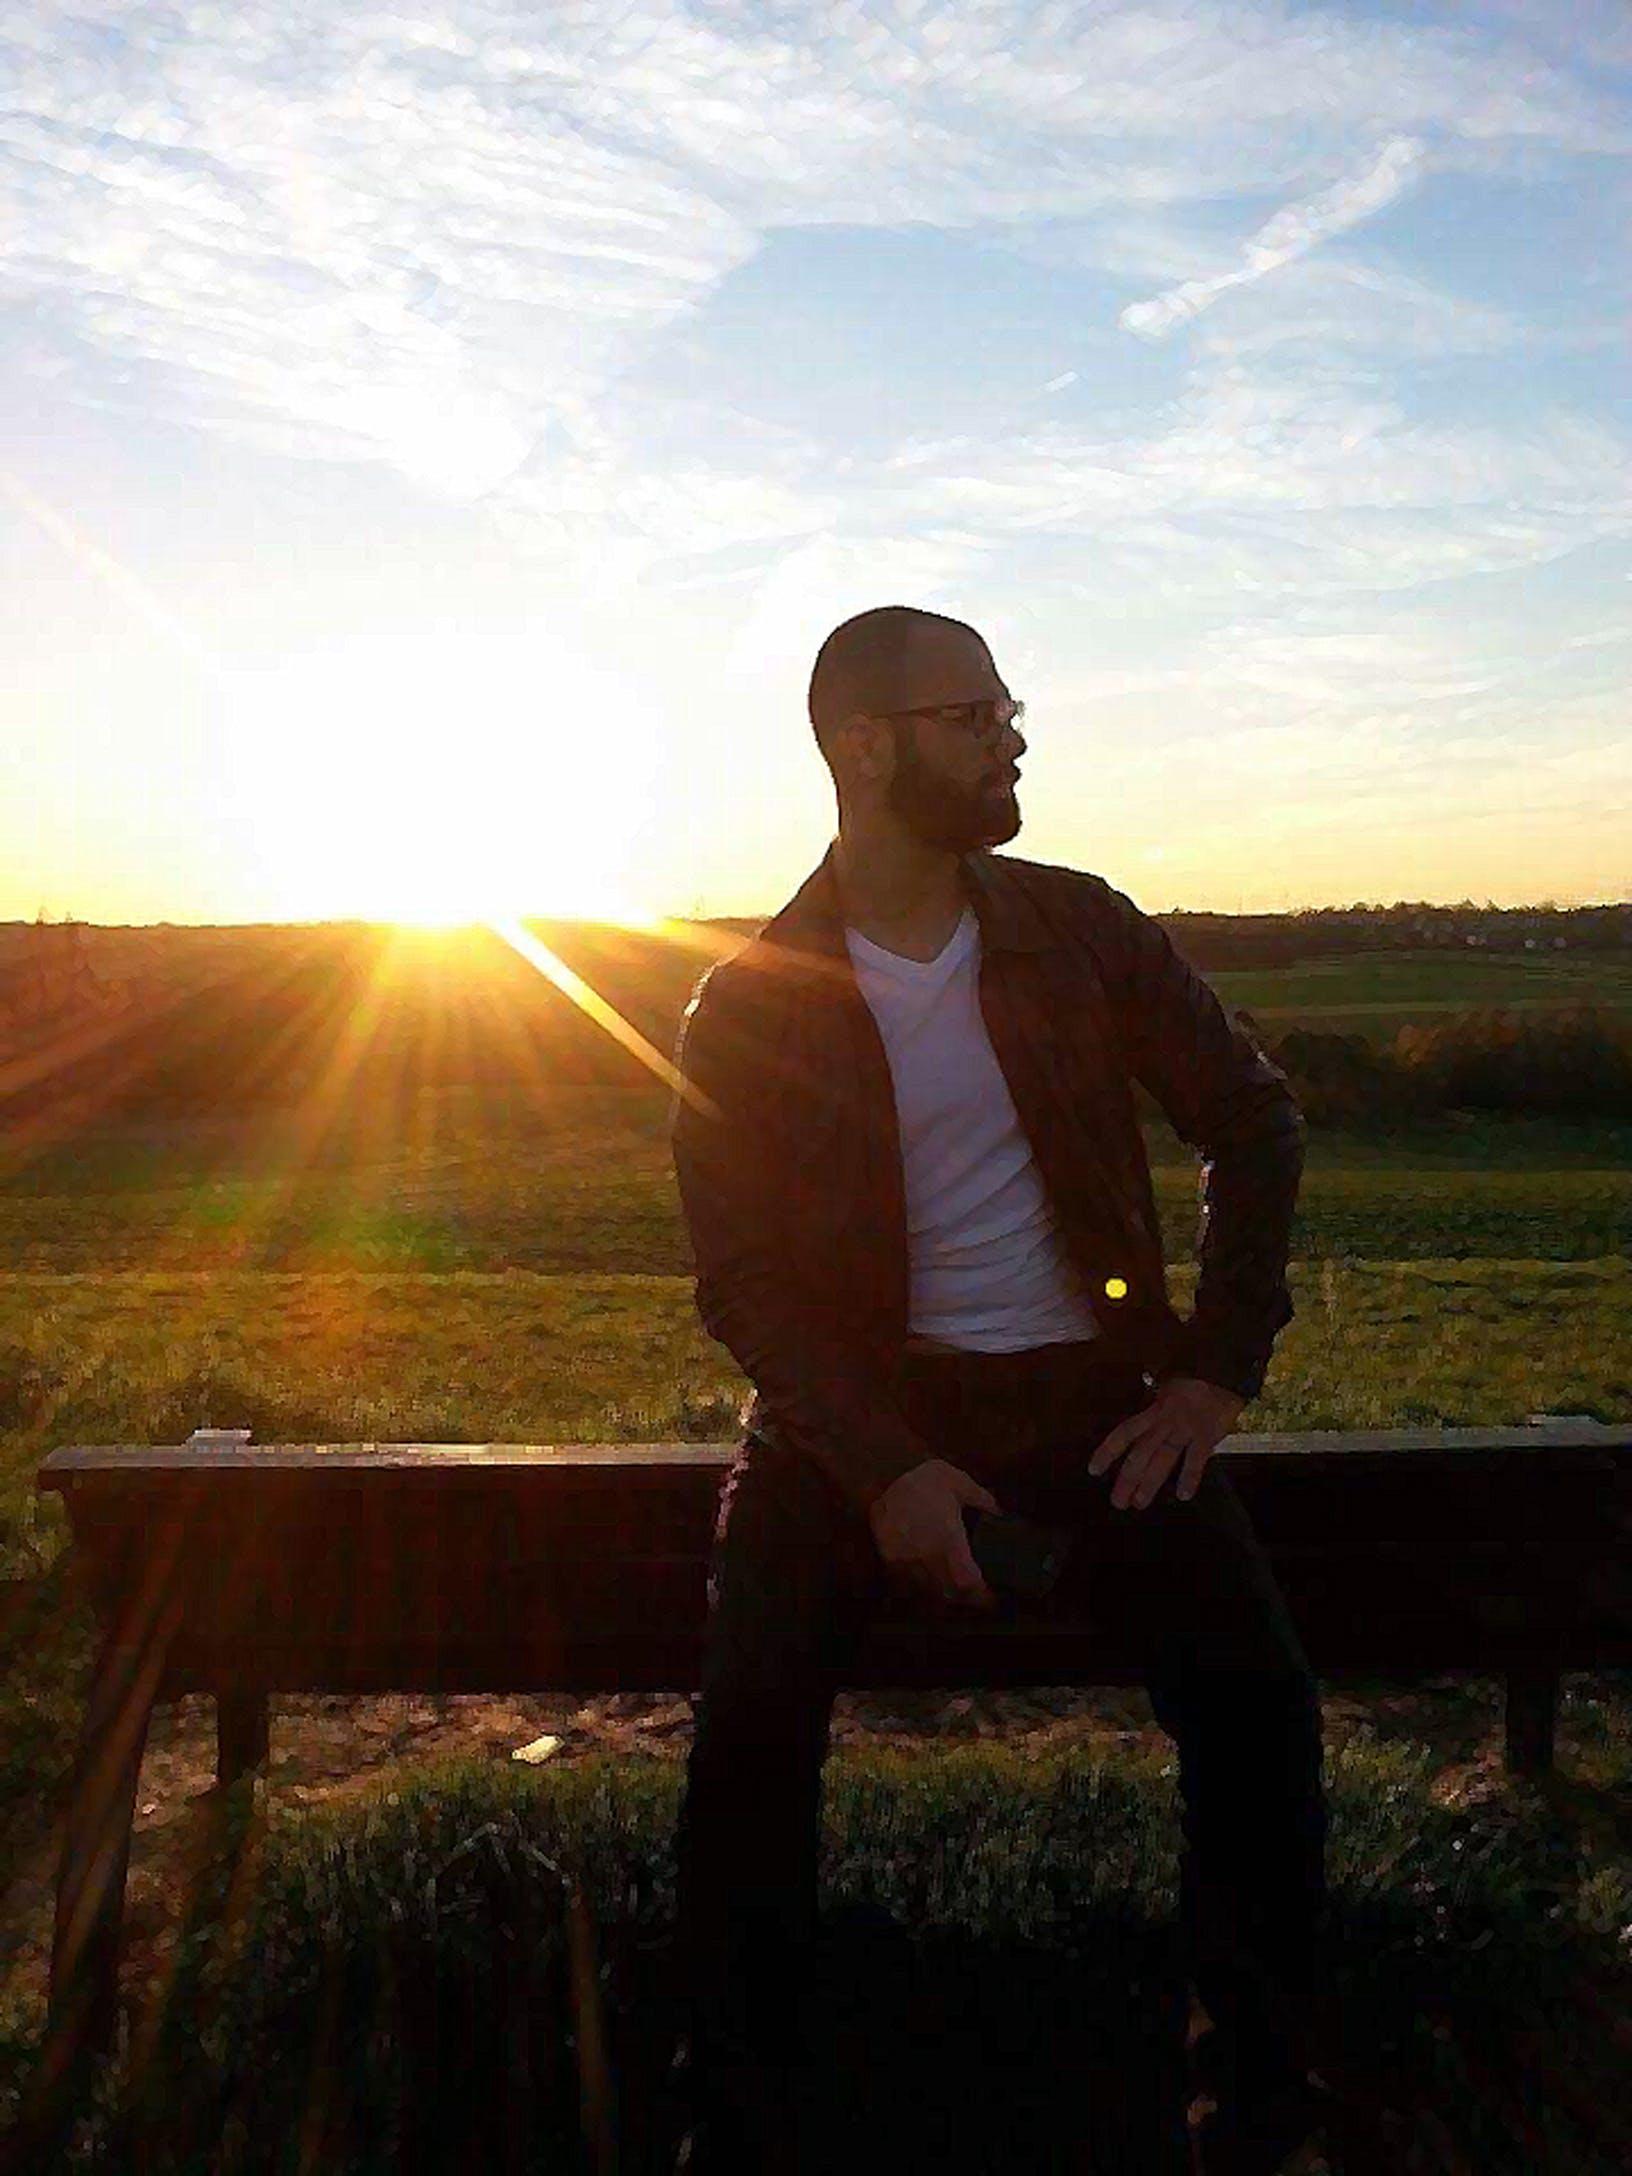 Free stock photo of sunset, fashion, man, person